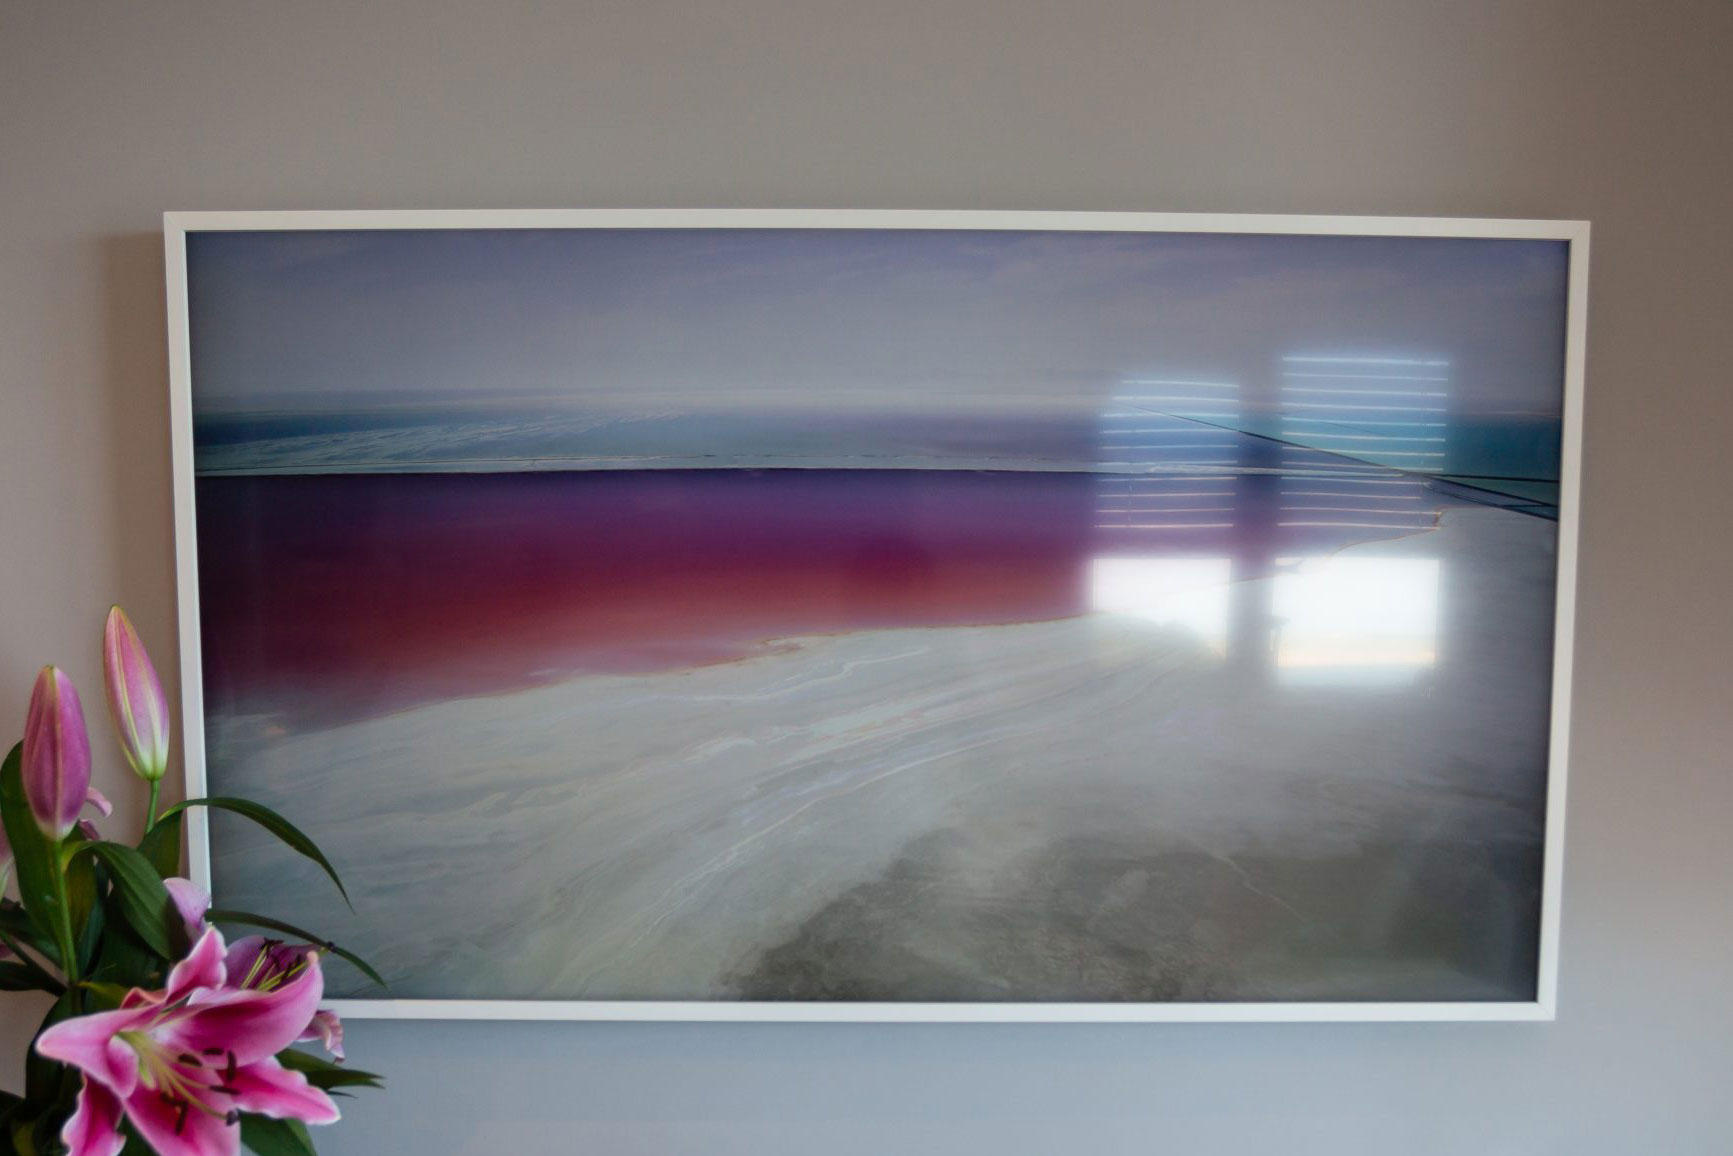 50 inch Samsung Frame Smart TV